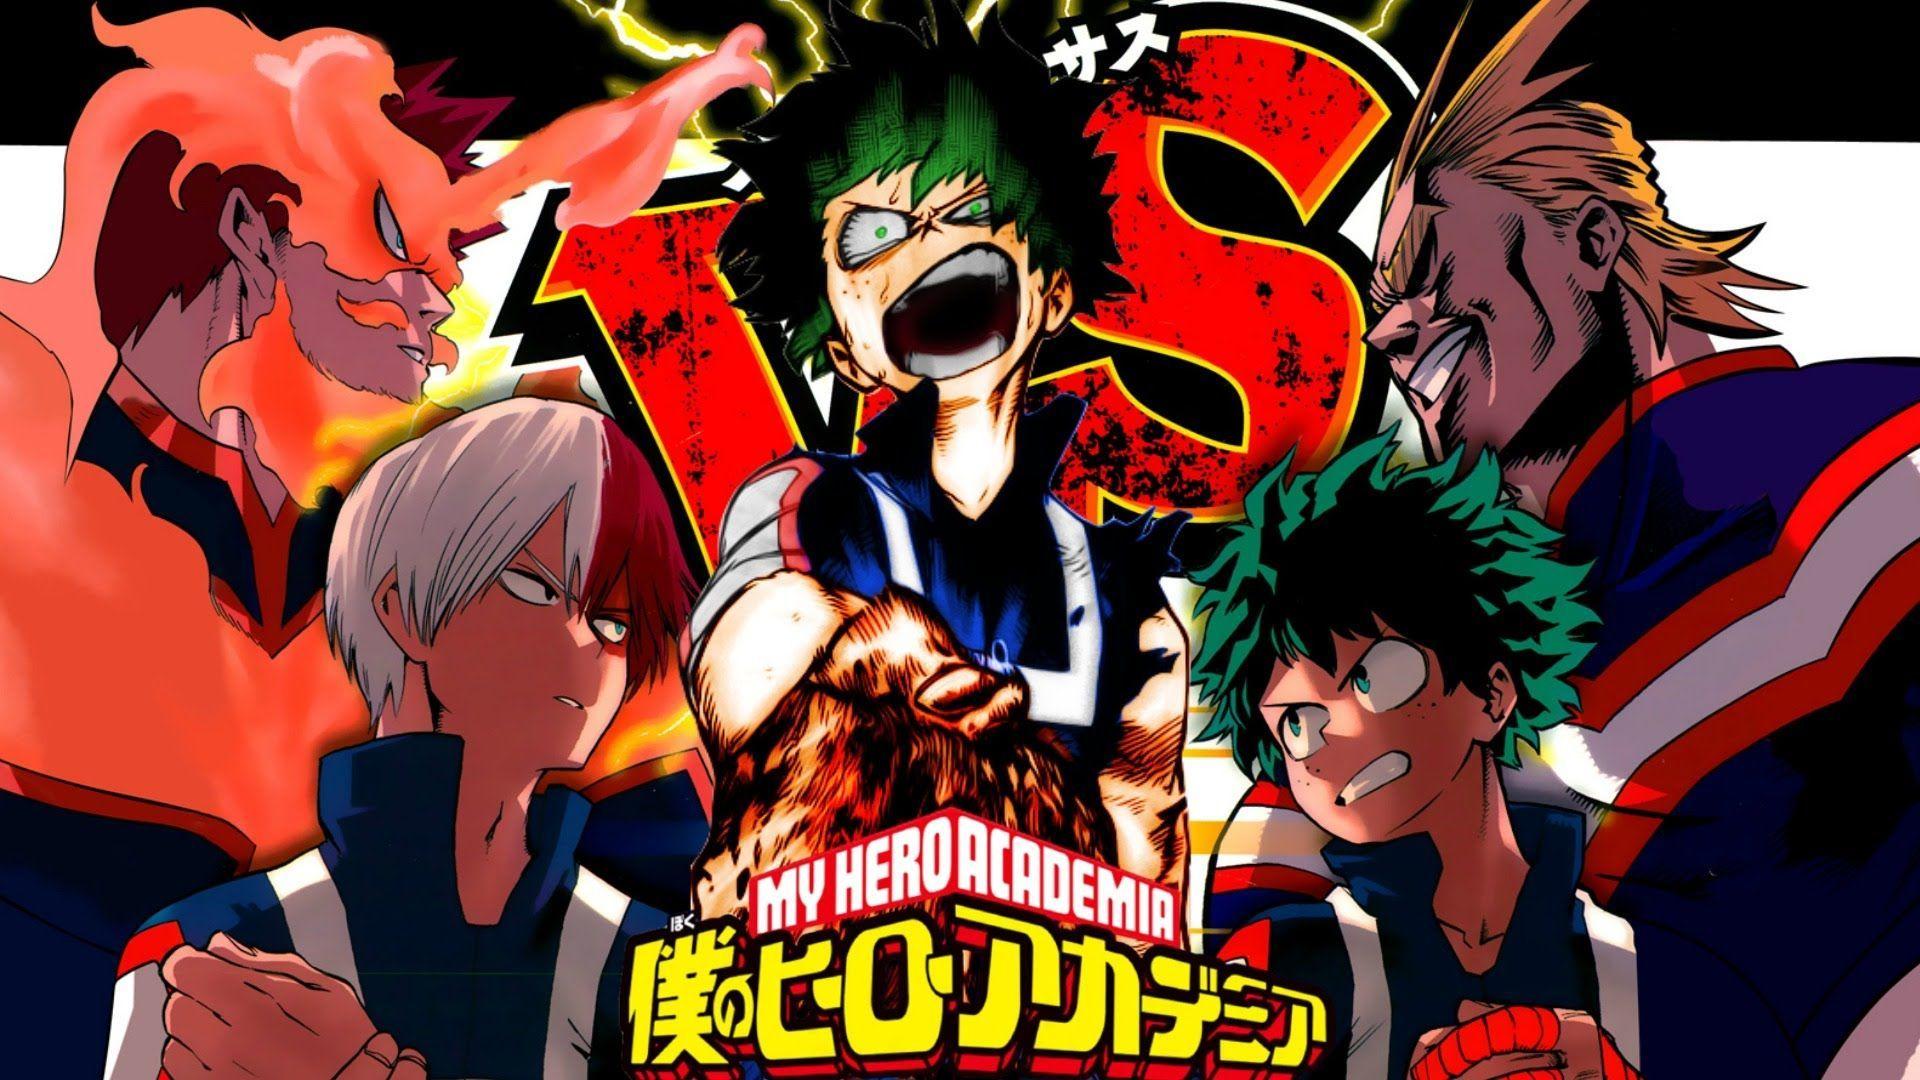 Xem phim Boku no Hero Academia 2nd Season (My Hero